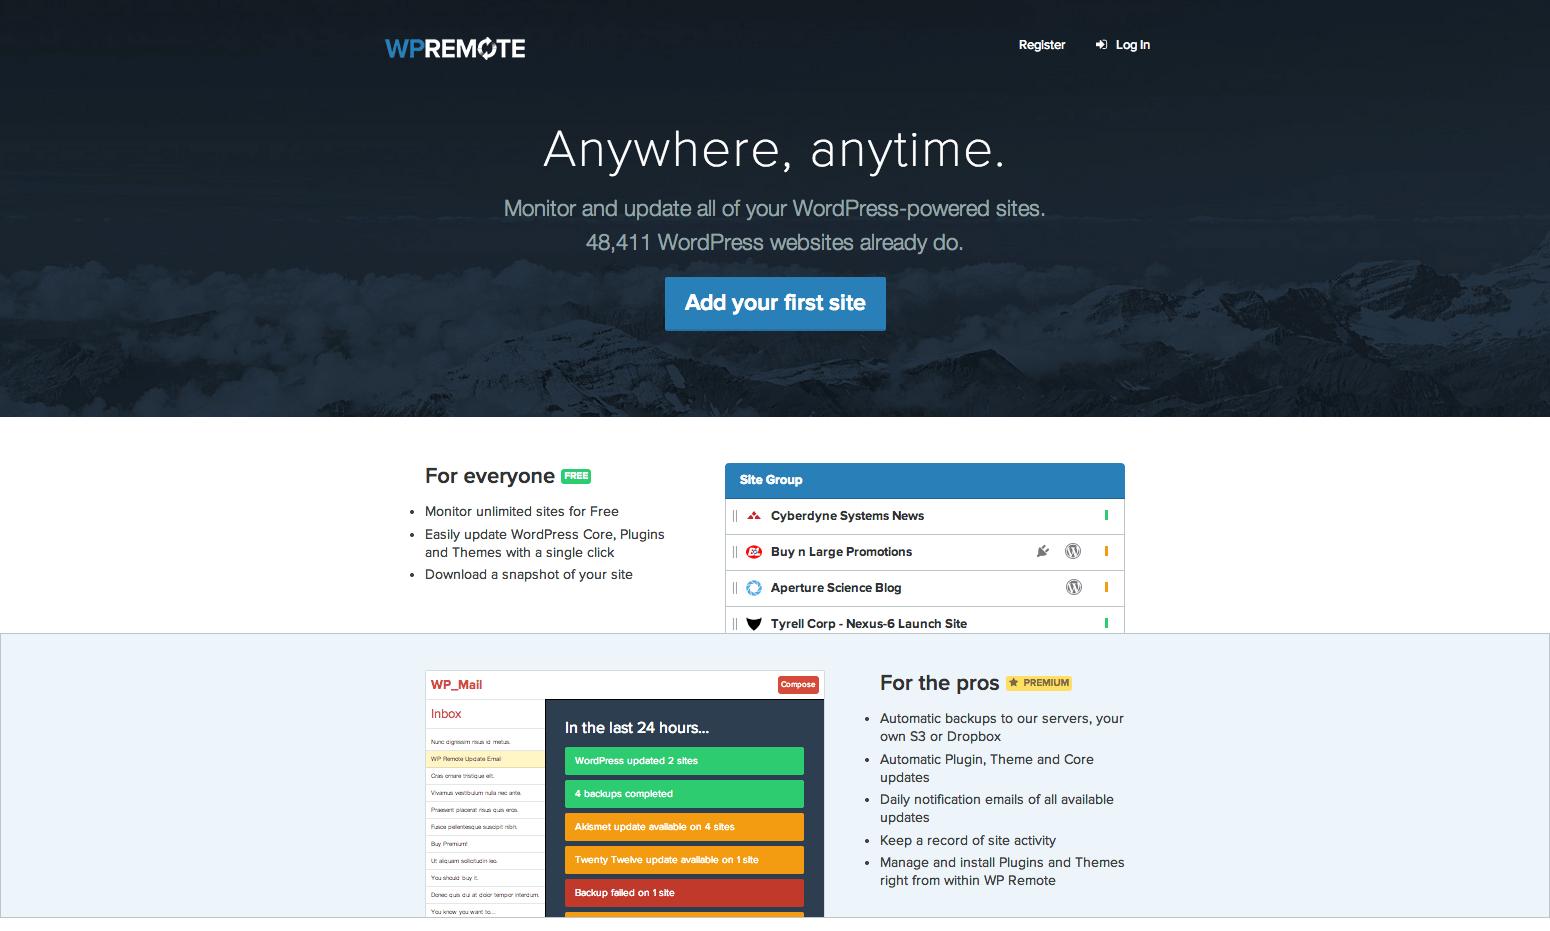 WPRemote.com homepage